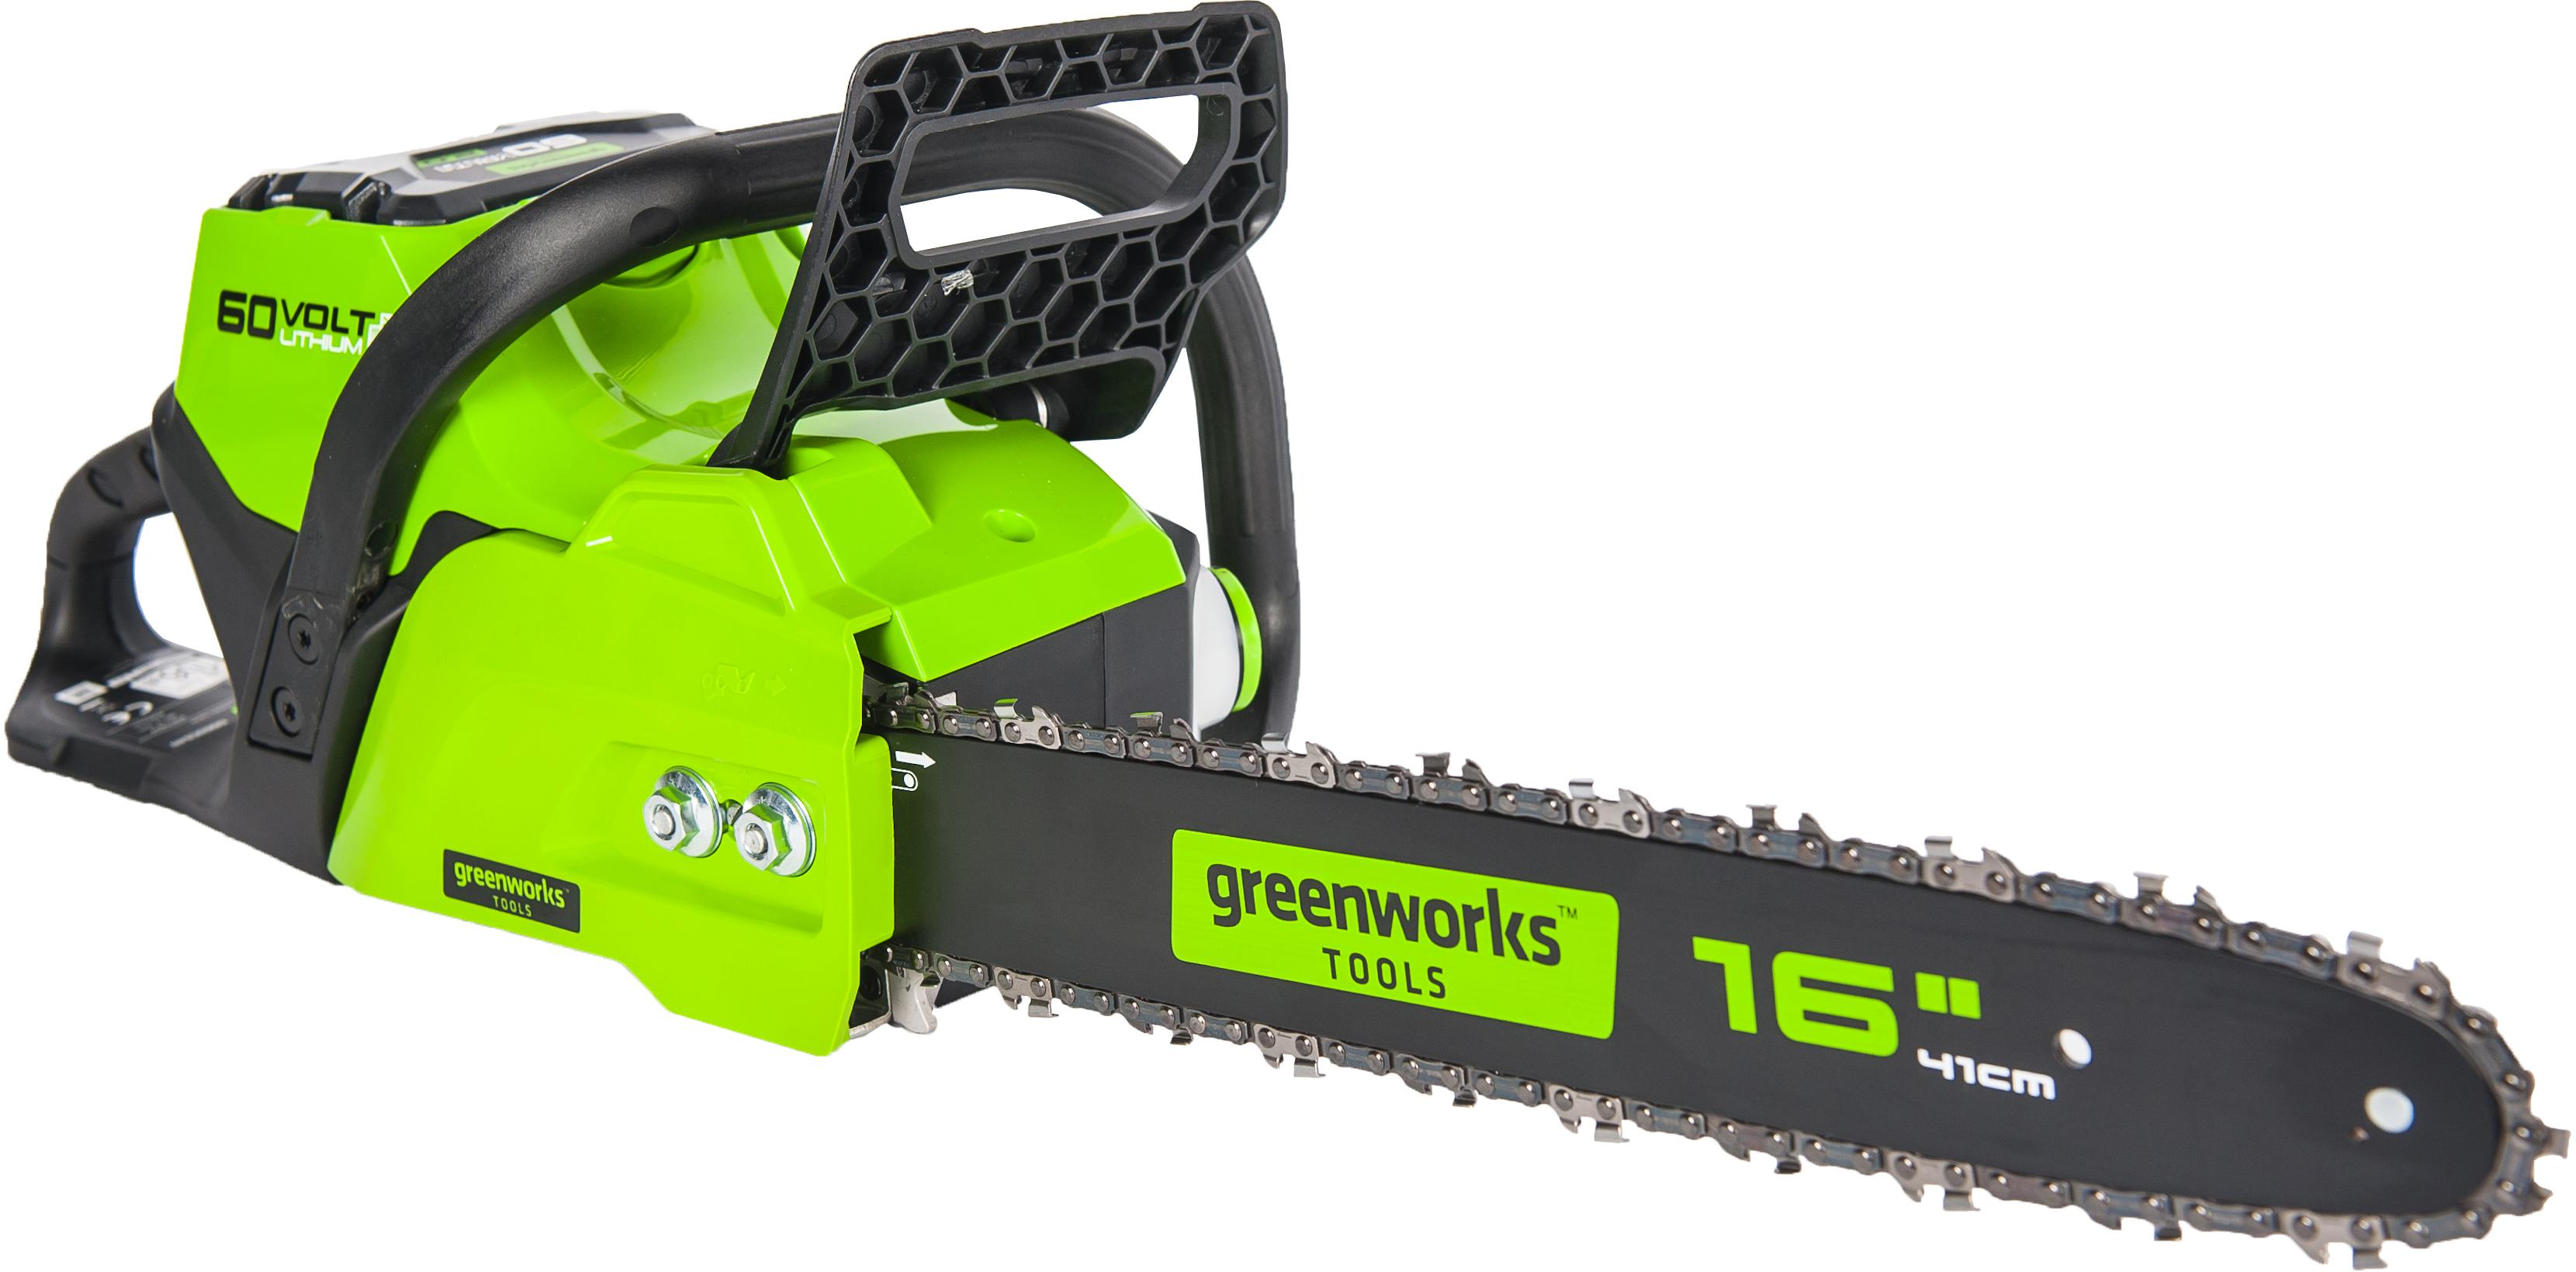 Пила цепная аккумуляторная Greenworks Gd60cs40k2 (2001807ua) 1акк 60В 2Ач + ЗУ пила цепная аккумуляторная greenworks gd60cs40 2001807 без аккум и зу